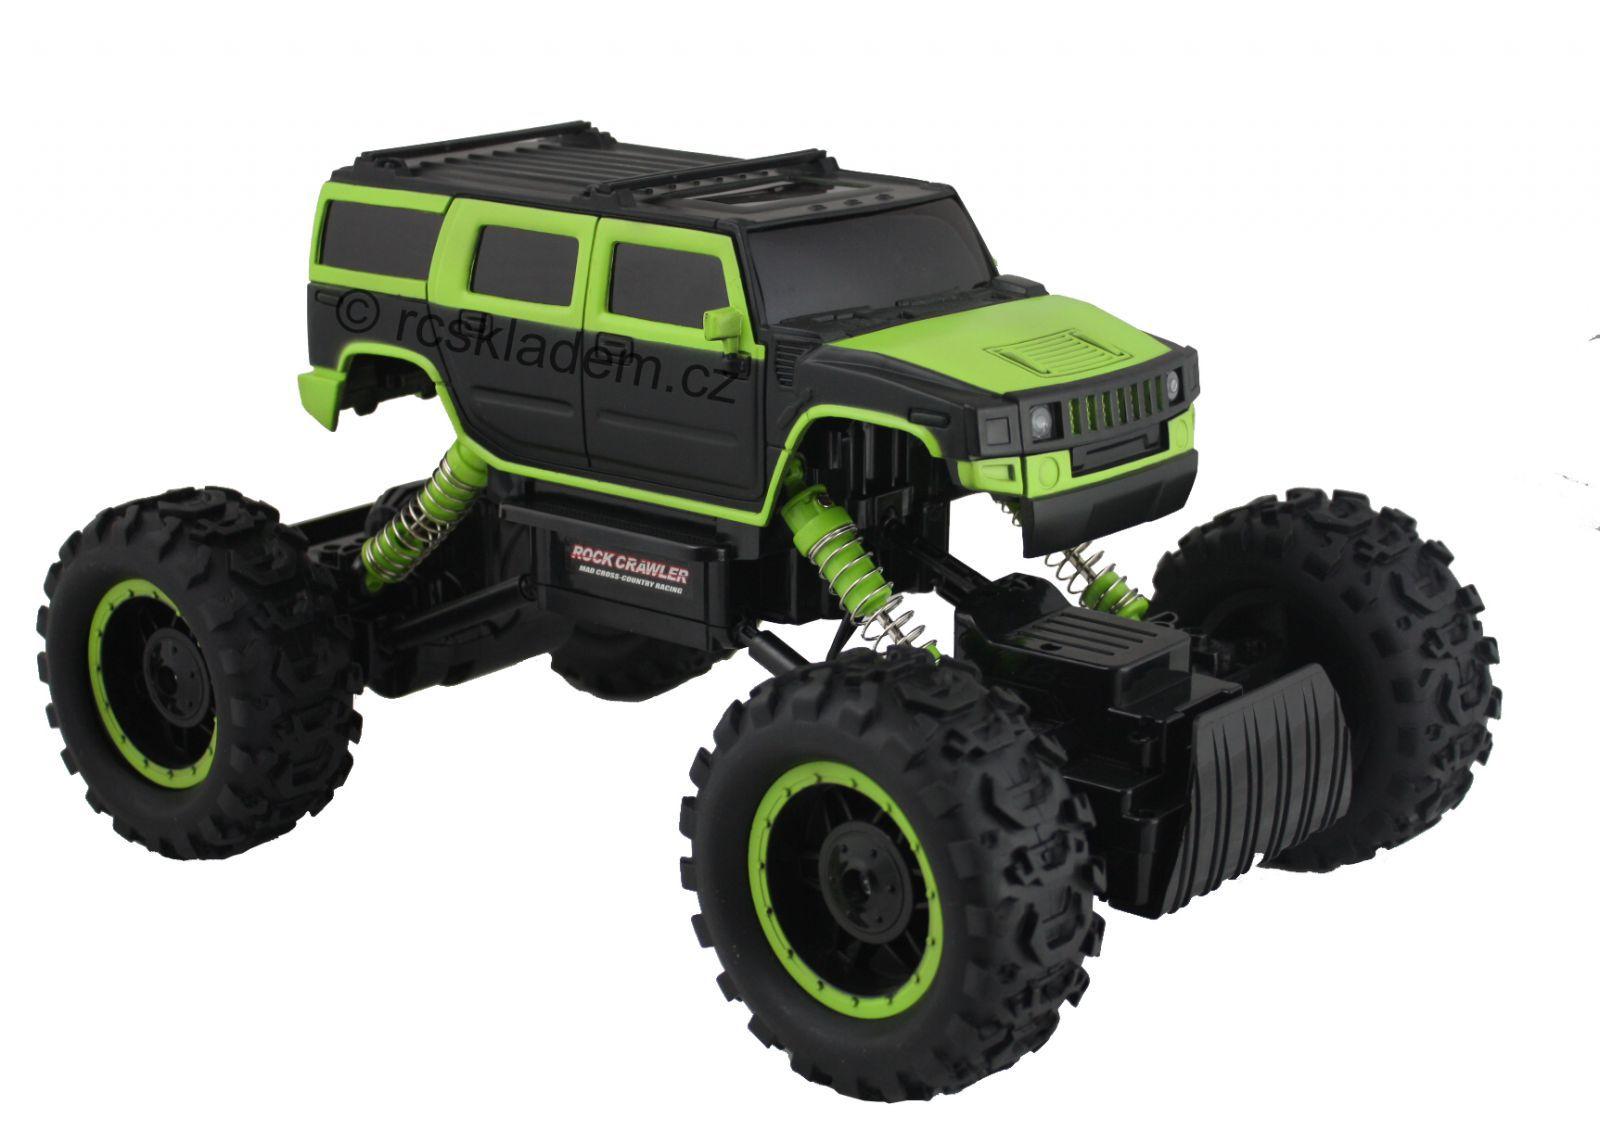 Hummer Truck Maistro 2,4Gh 36cm